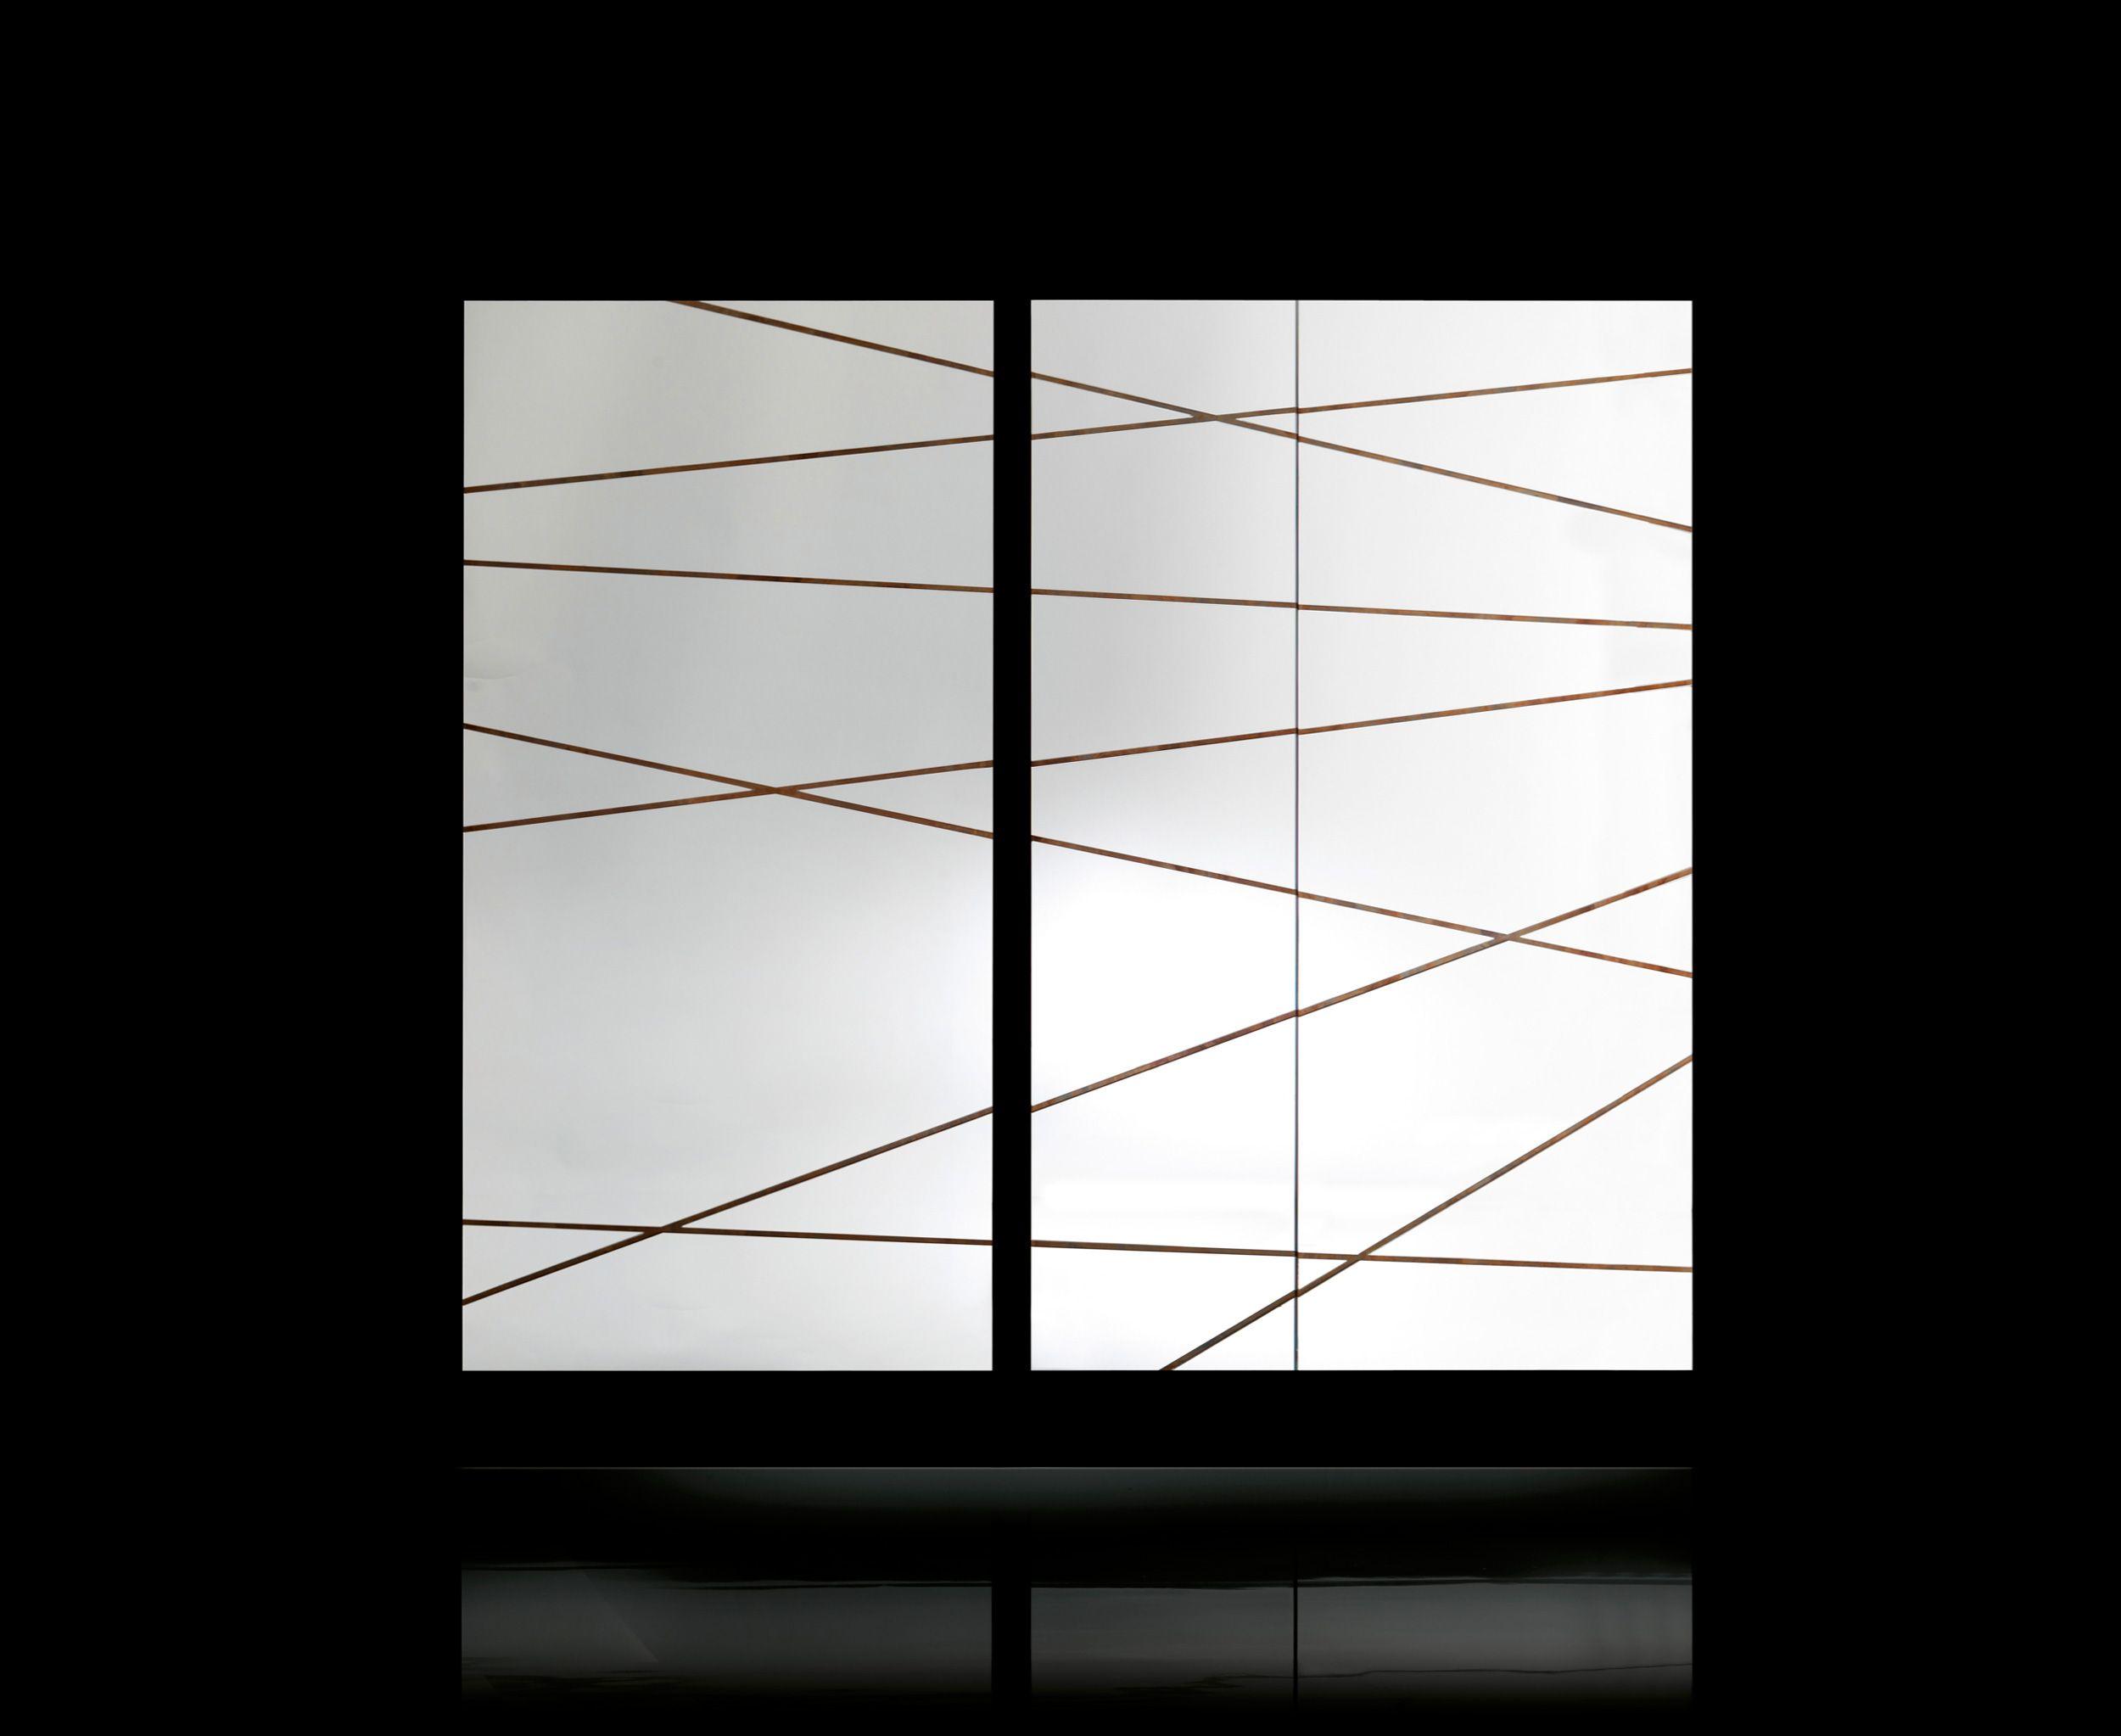 Henge -EDGE MIRROR - Henge - furniture home design